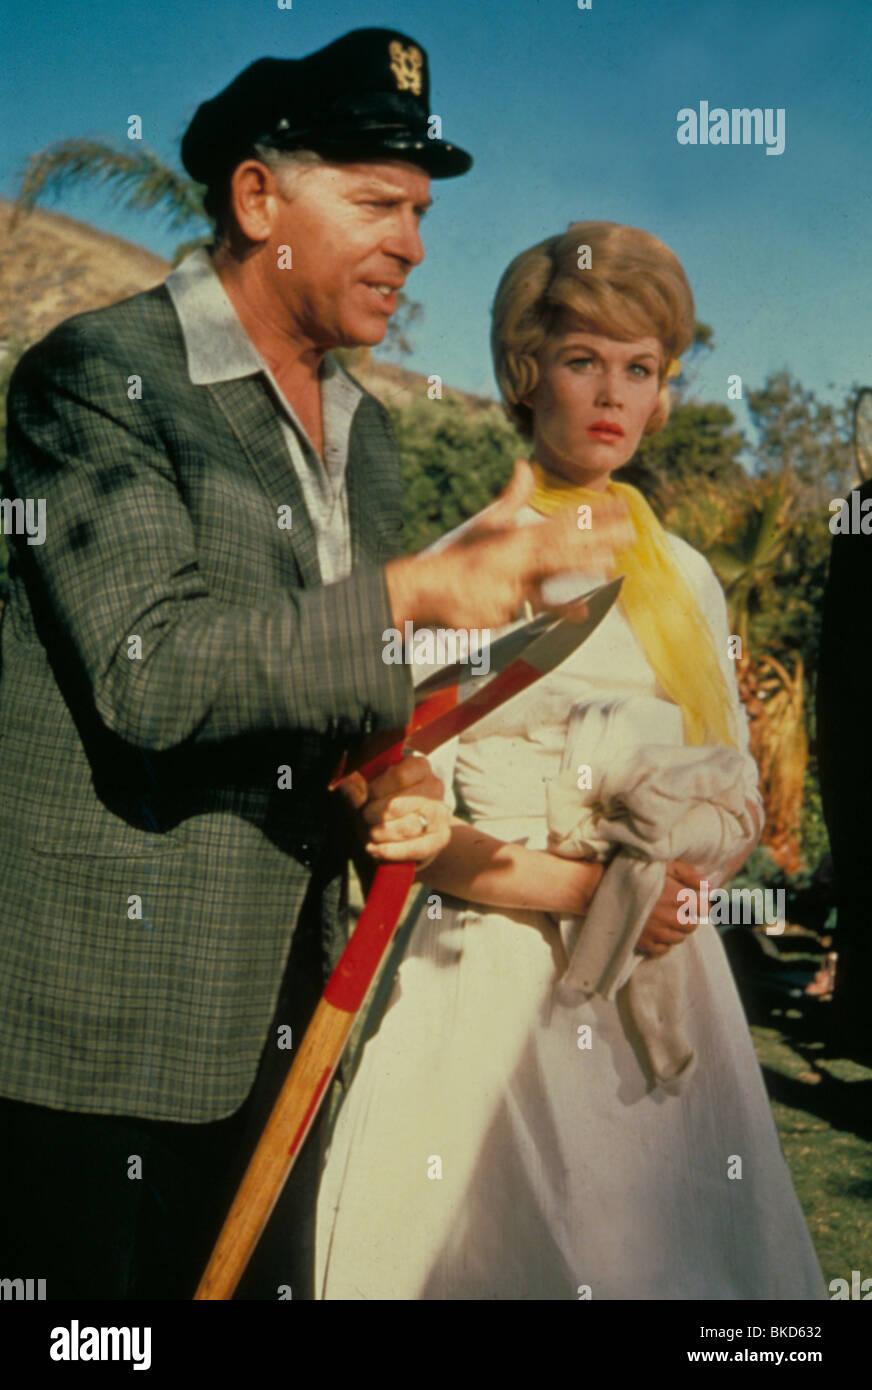 IT'S A MAD MAD MAD MAD WORLD (1963) MILTON BERLE IMMW 004 L - Stock Image